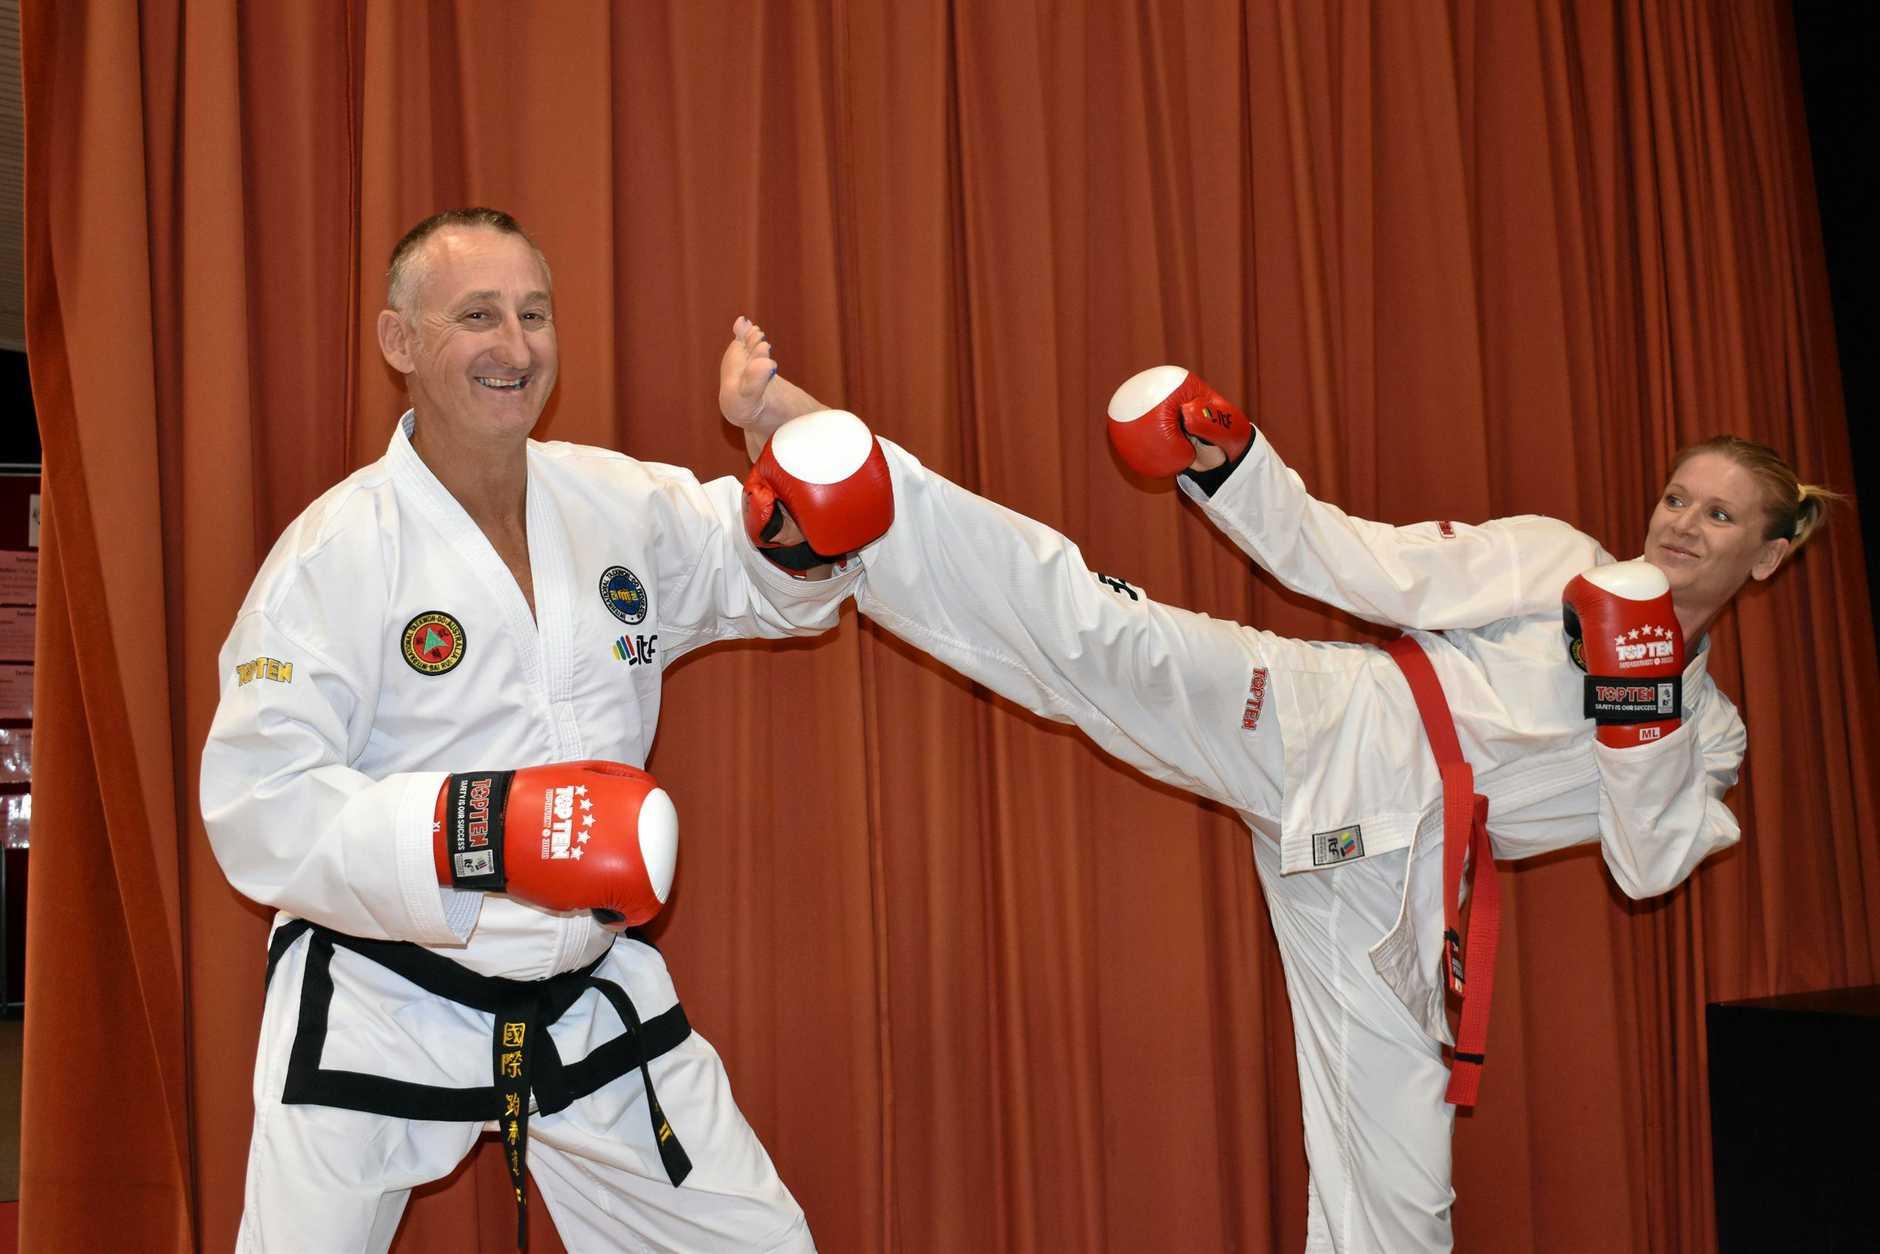 KICK PUNCH: Bai Rui Taekwon-Do Laidley instructor Darren Finch will travel to New Zealand next week for training.